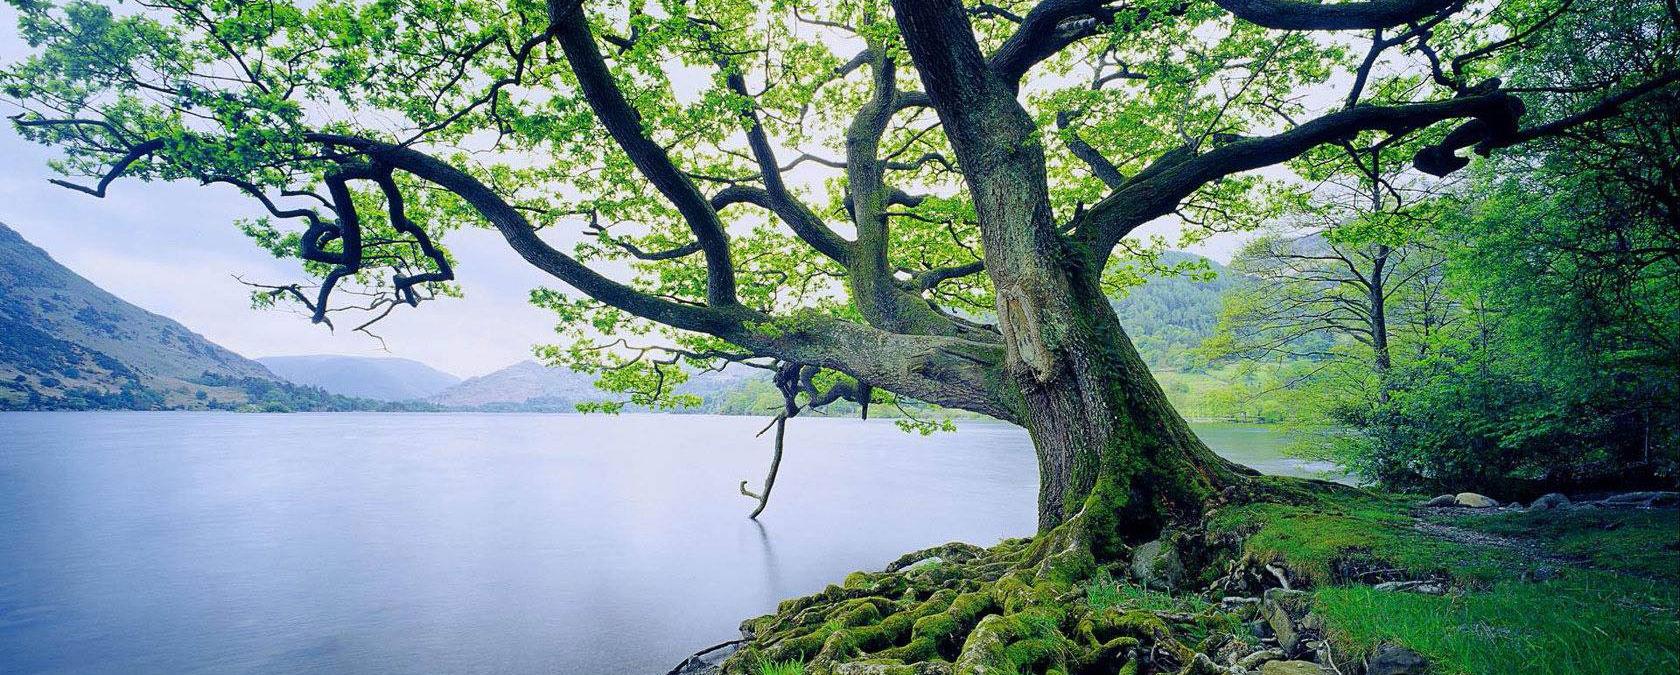 life-tree2